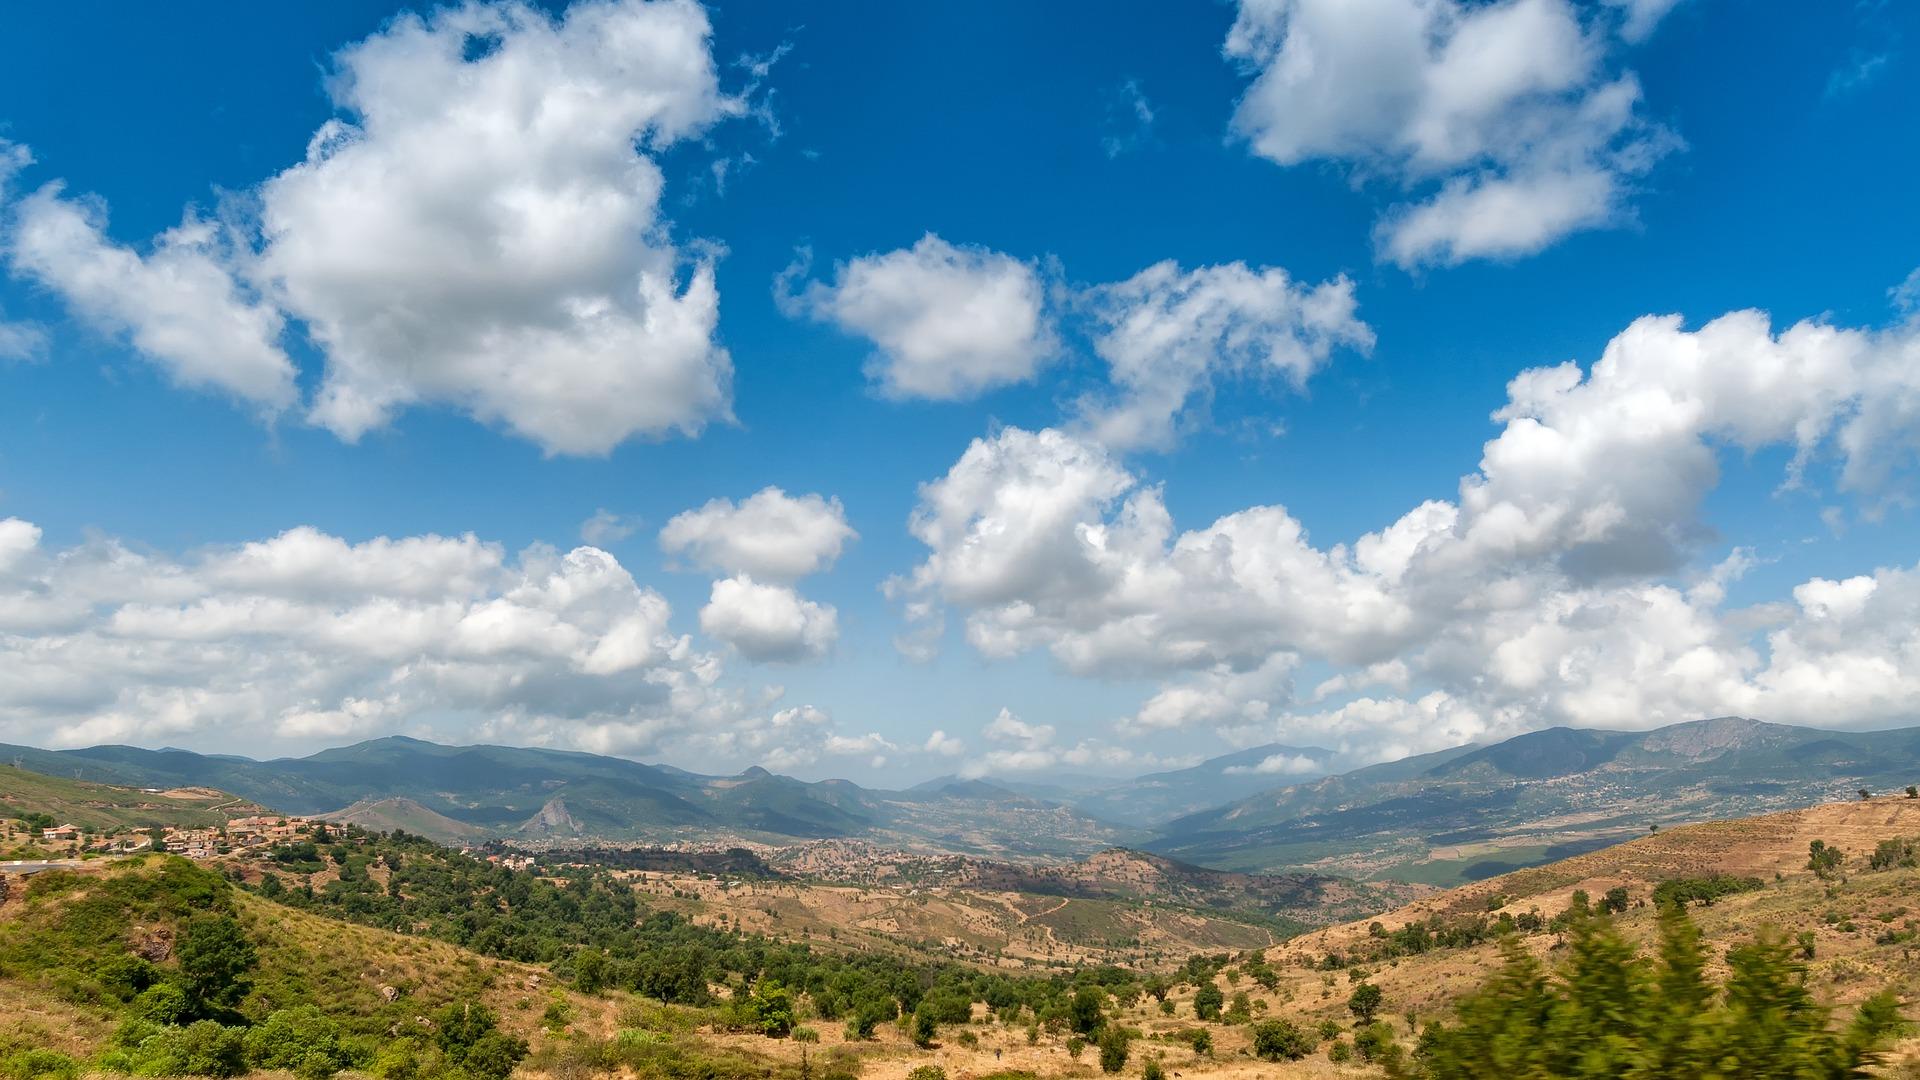 Cezayir iklimi